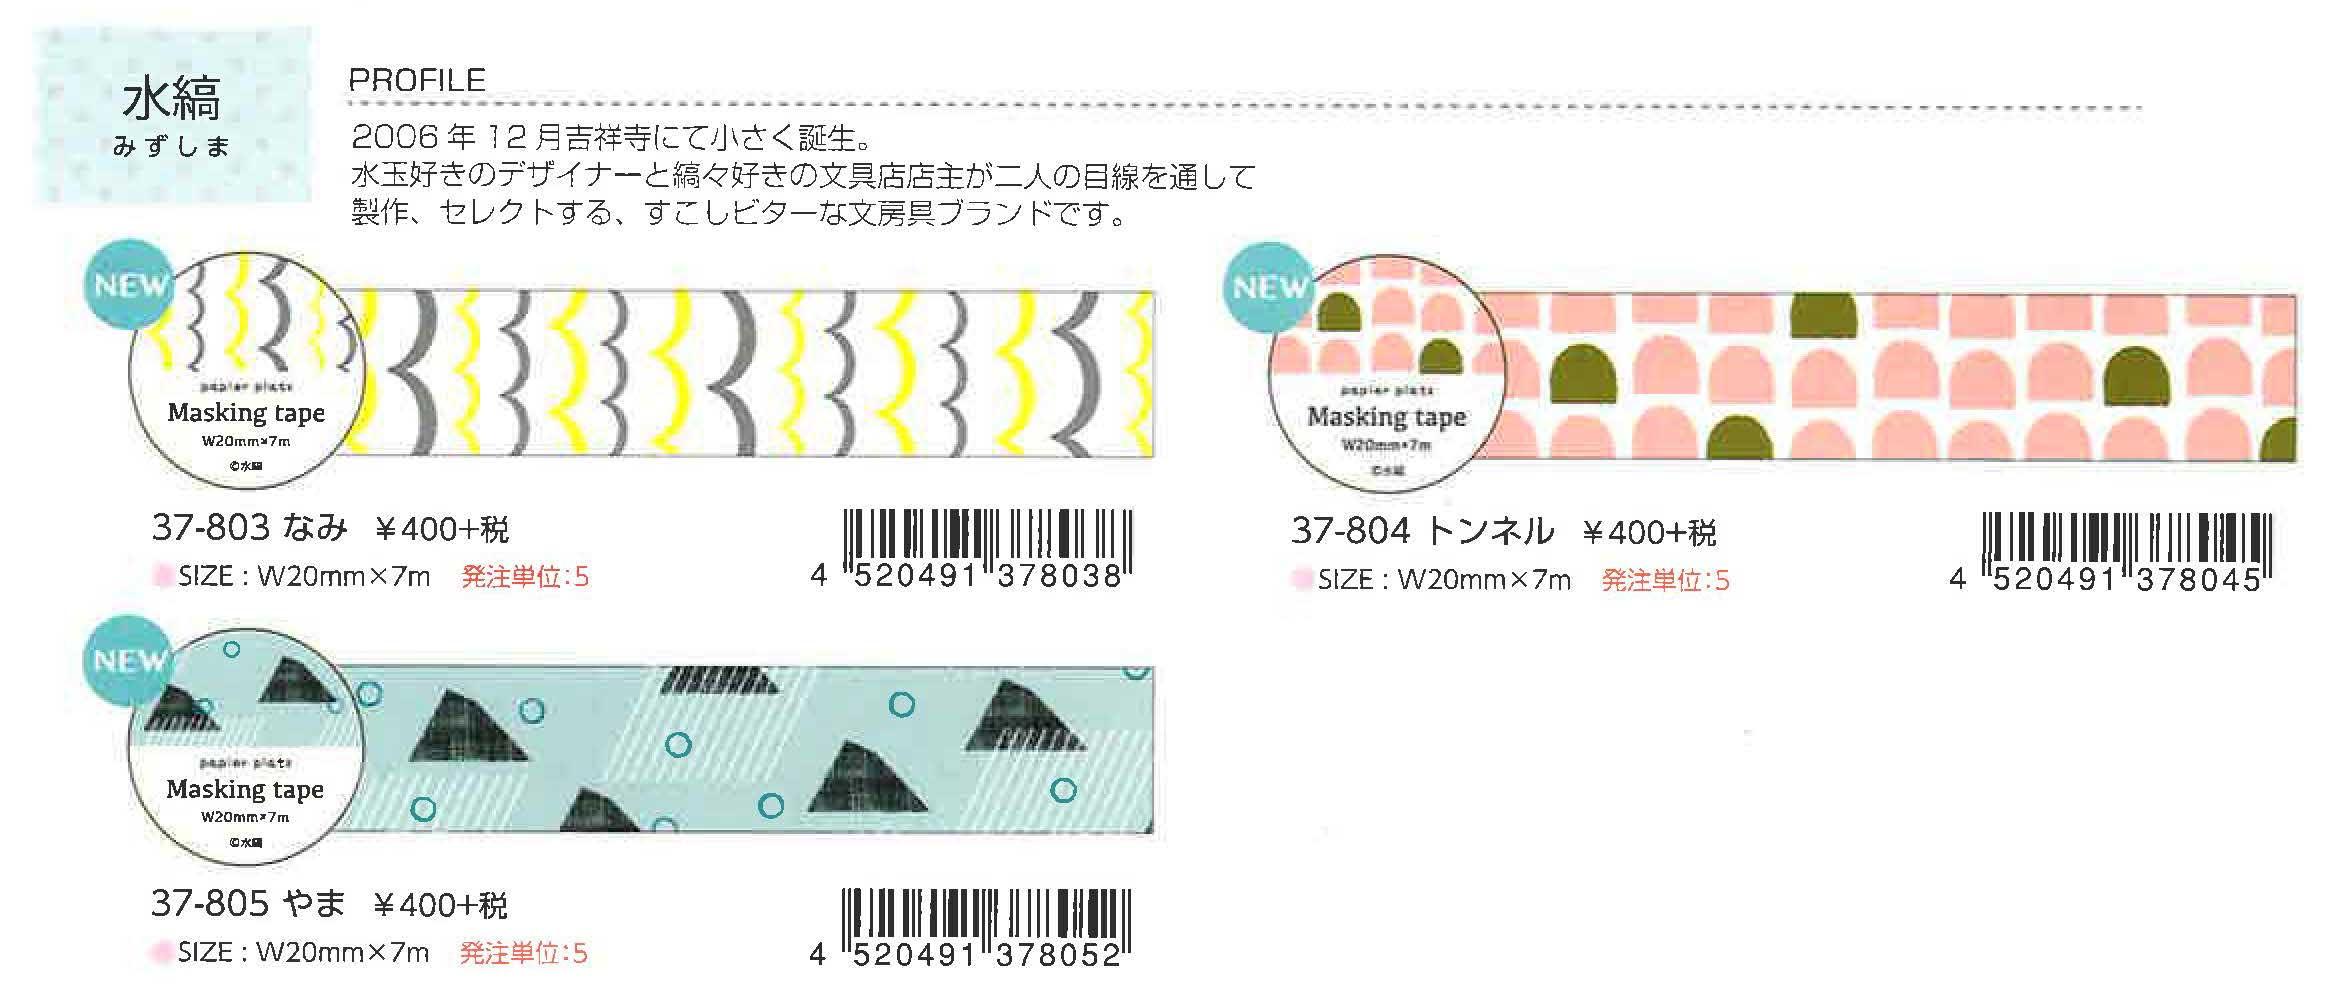 【Papier Platz】デザイナーズ マスキングテープ 水縞(みずしま) 3種 2019_7_26発売